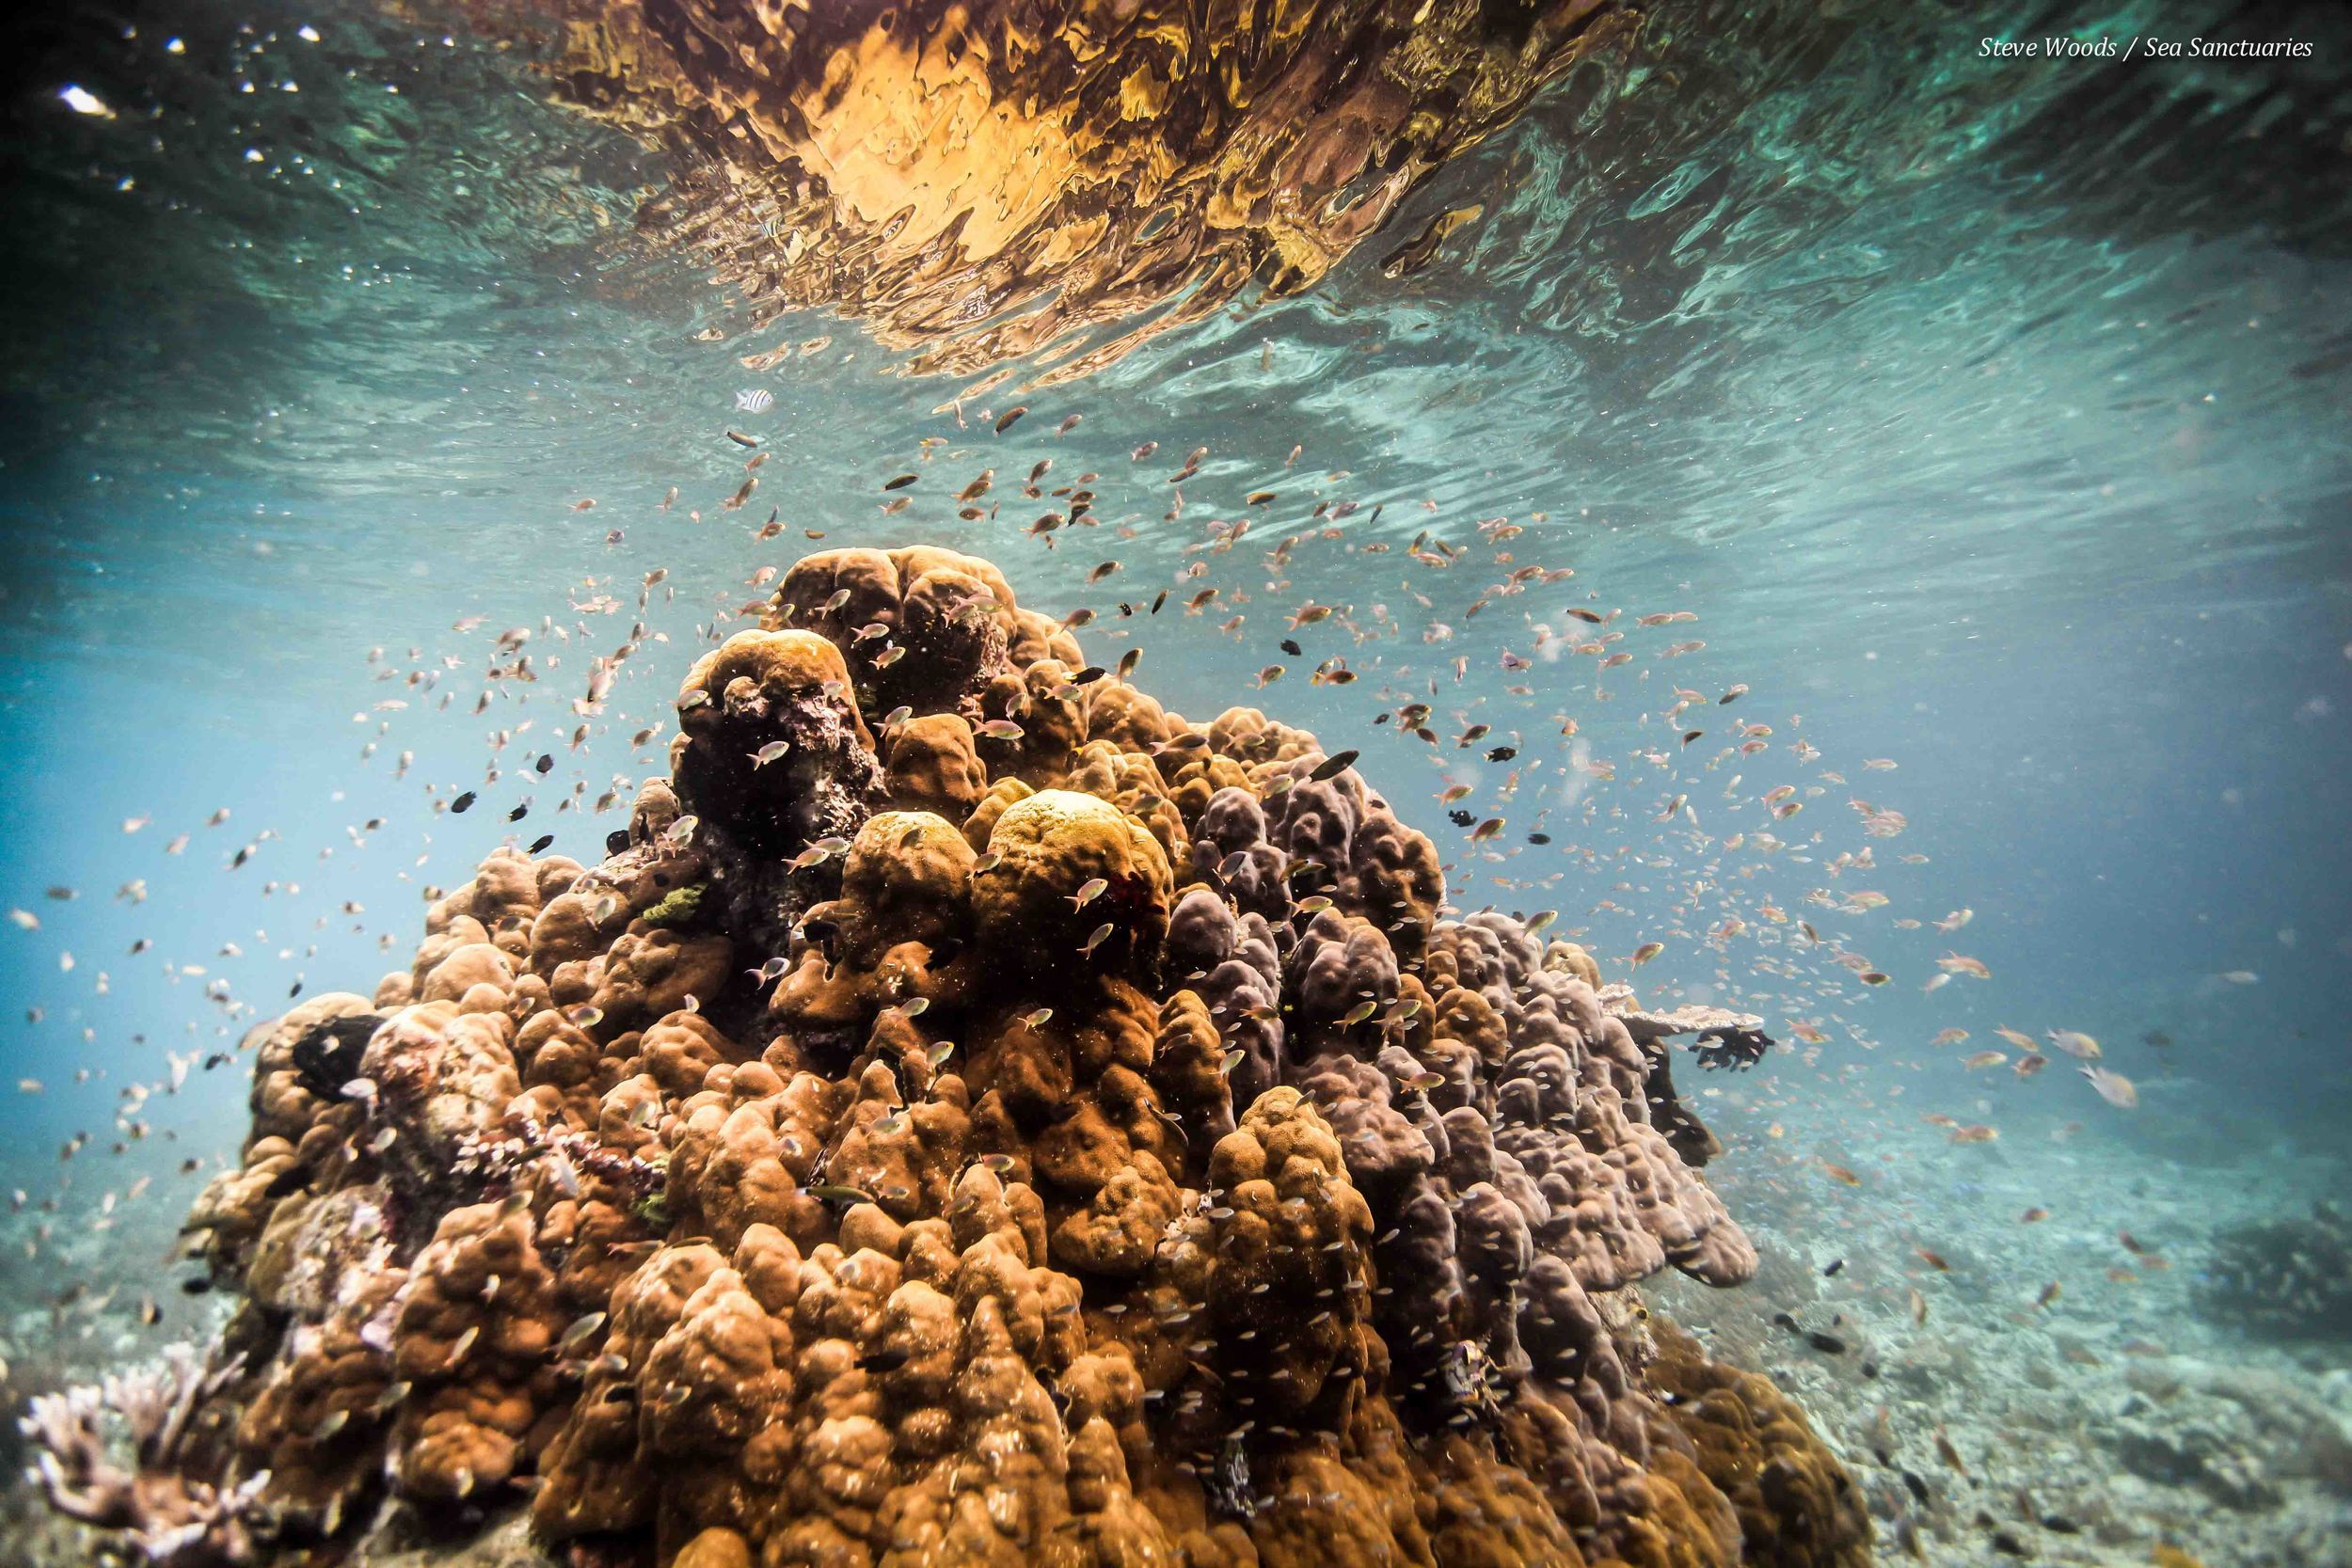 Pristine had coral colonies